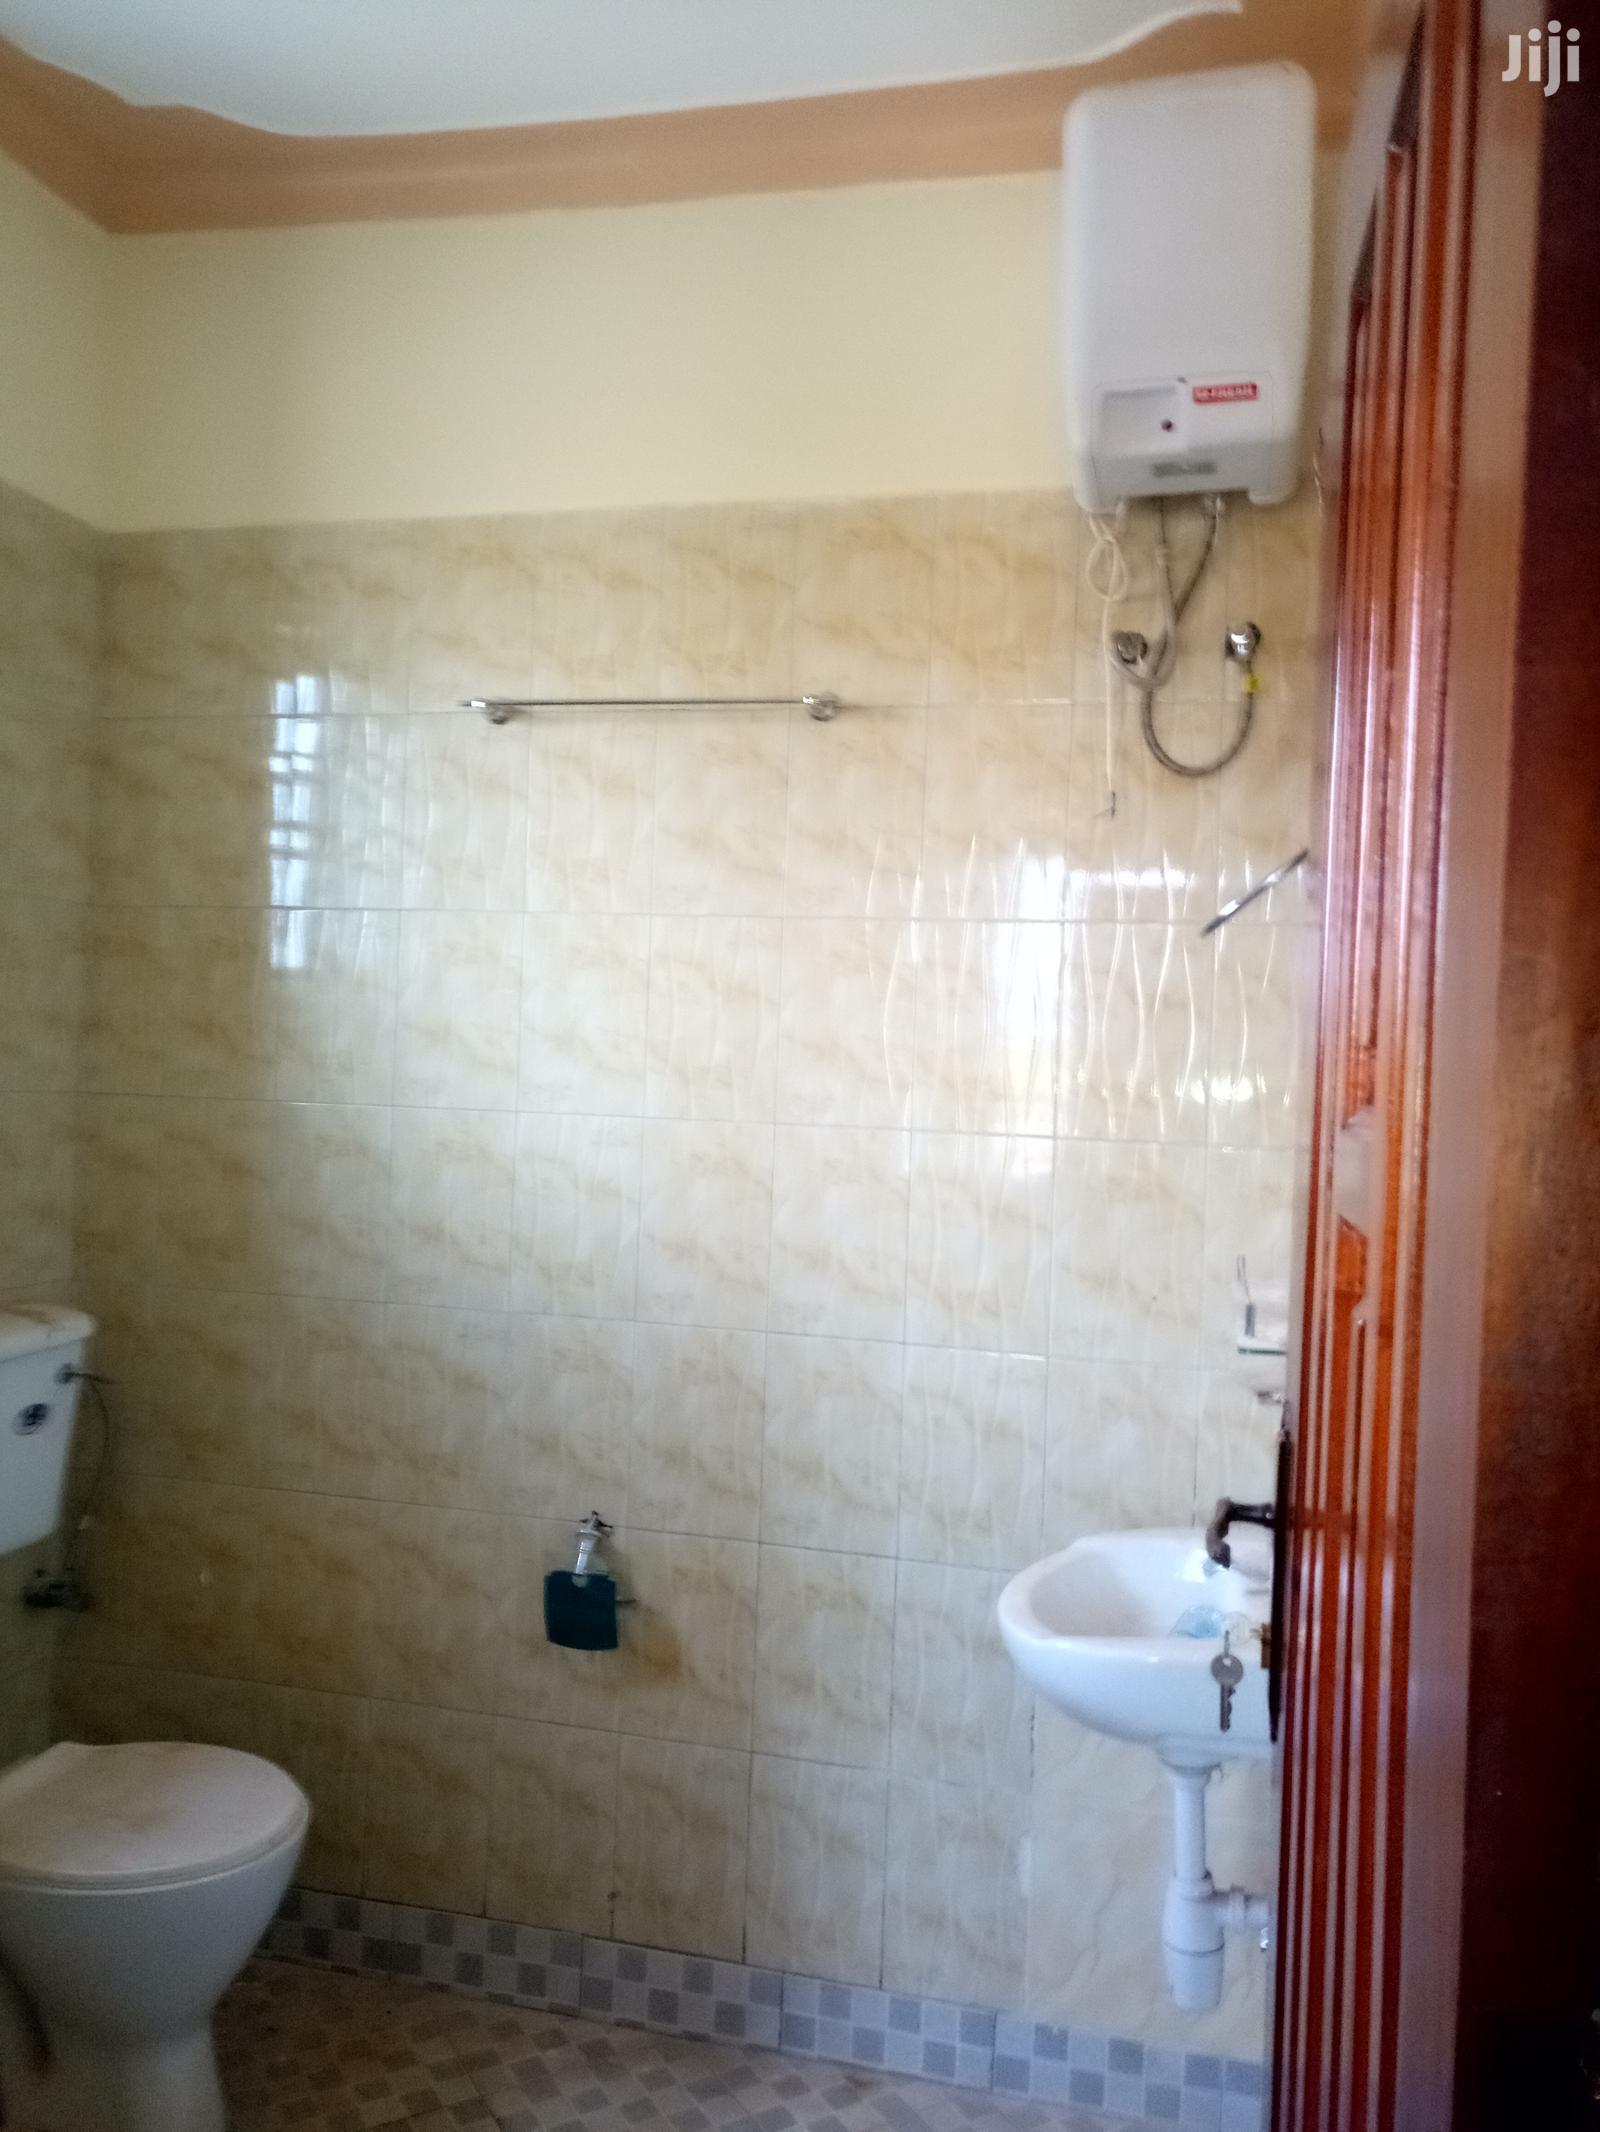 NAMUGONGO Three Bedroom Apartment House For Rent | Houses & Apartments For Rent for sale in Kampala, Central Region, Uganda